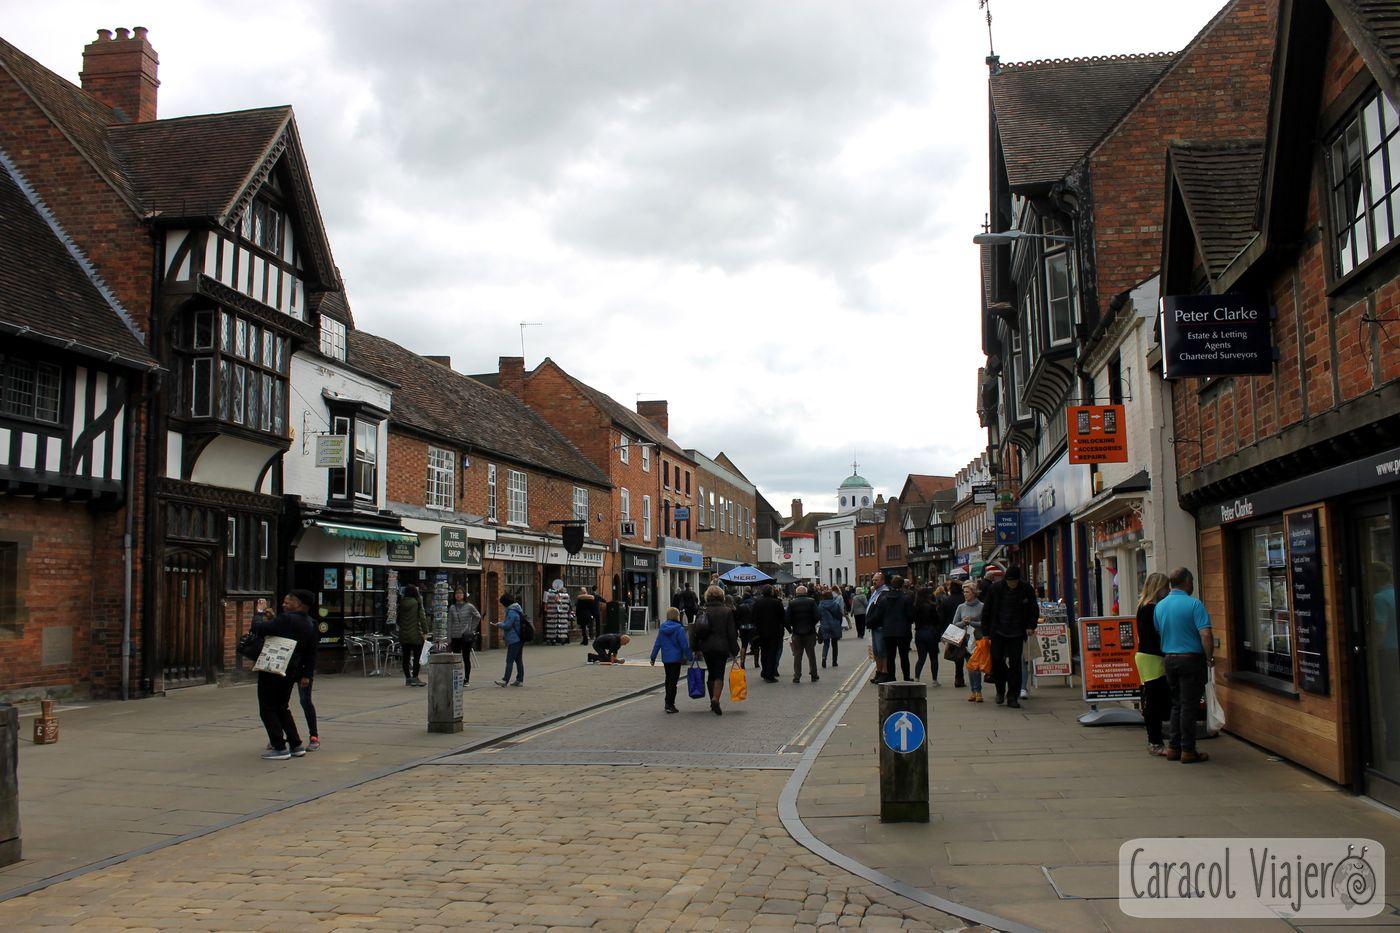 calle de Stratford - lugar de nacimiento de Shakespeare